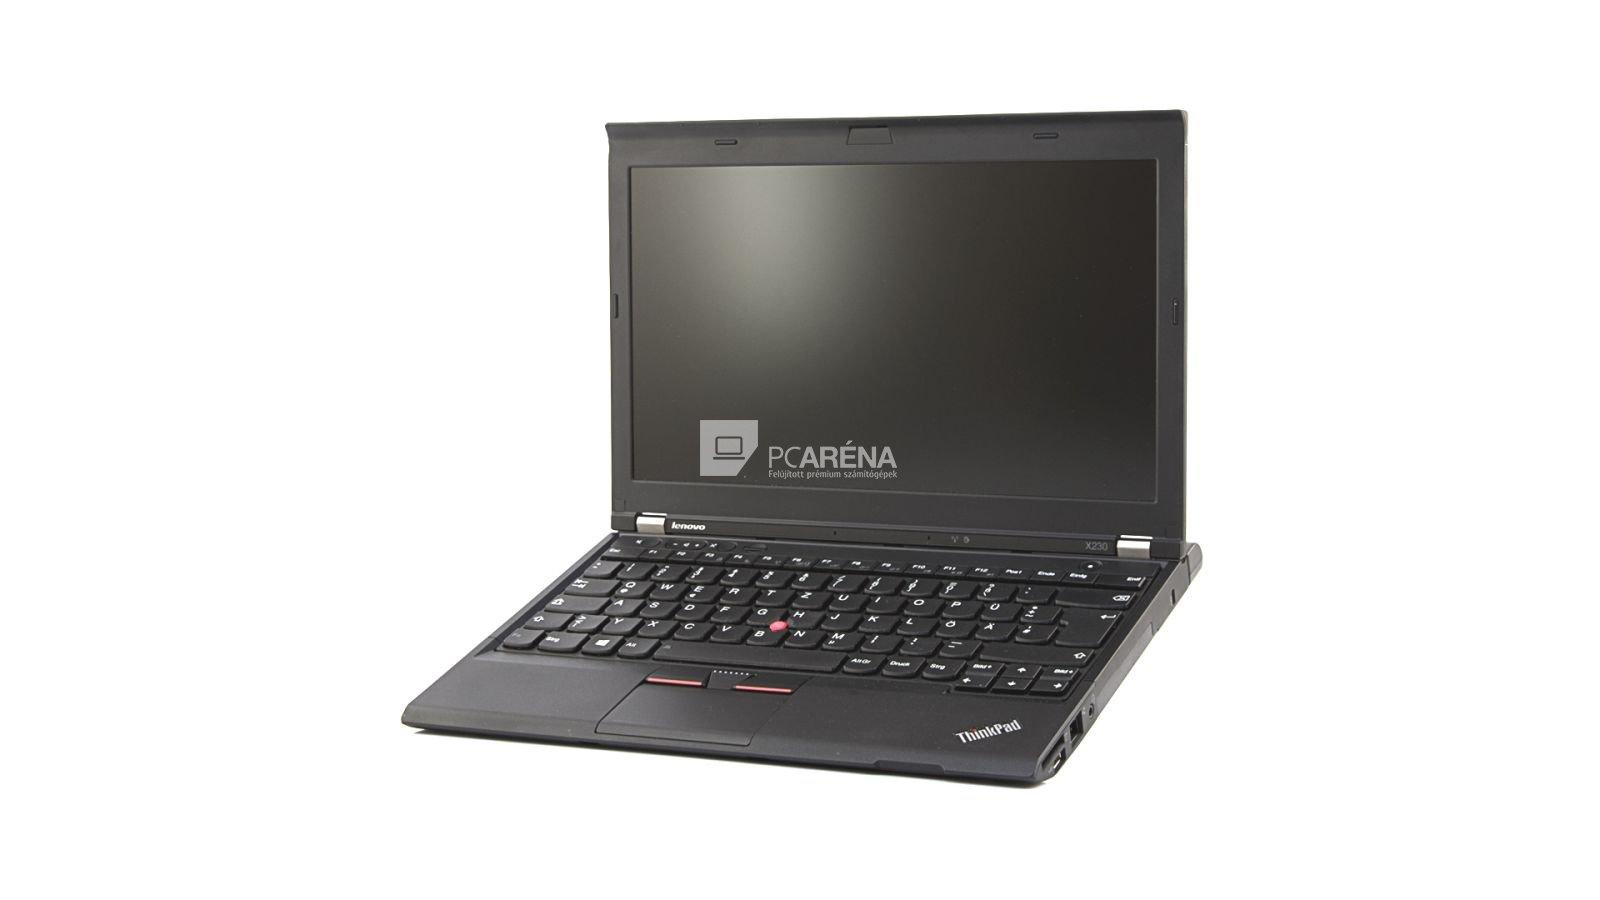 Lenovo ThinkPad X230 laptop